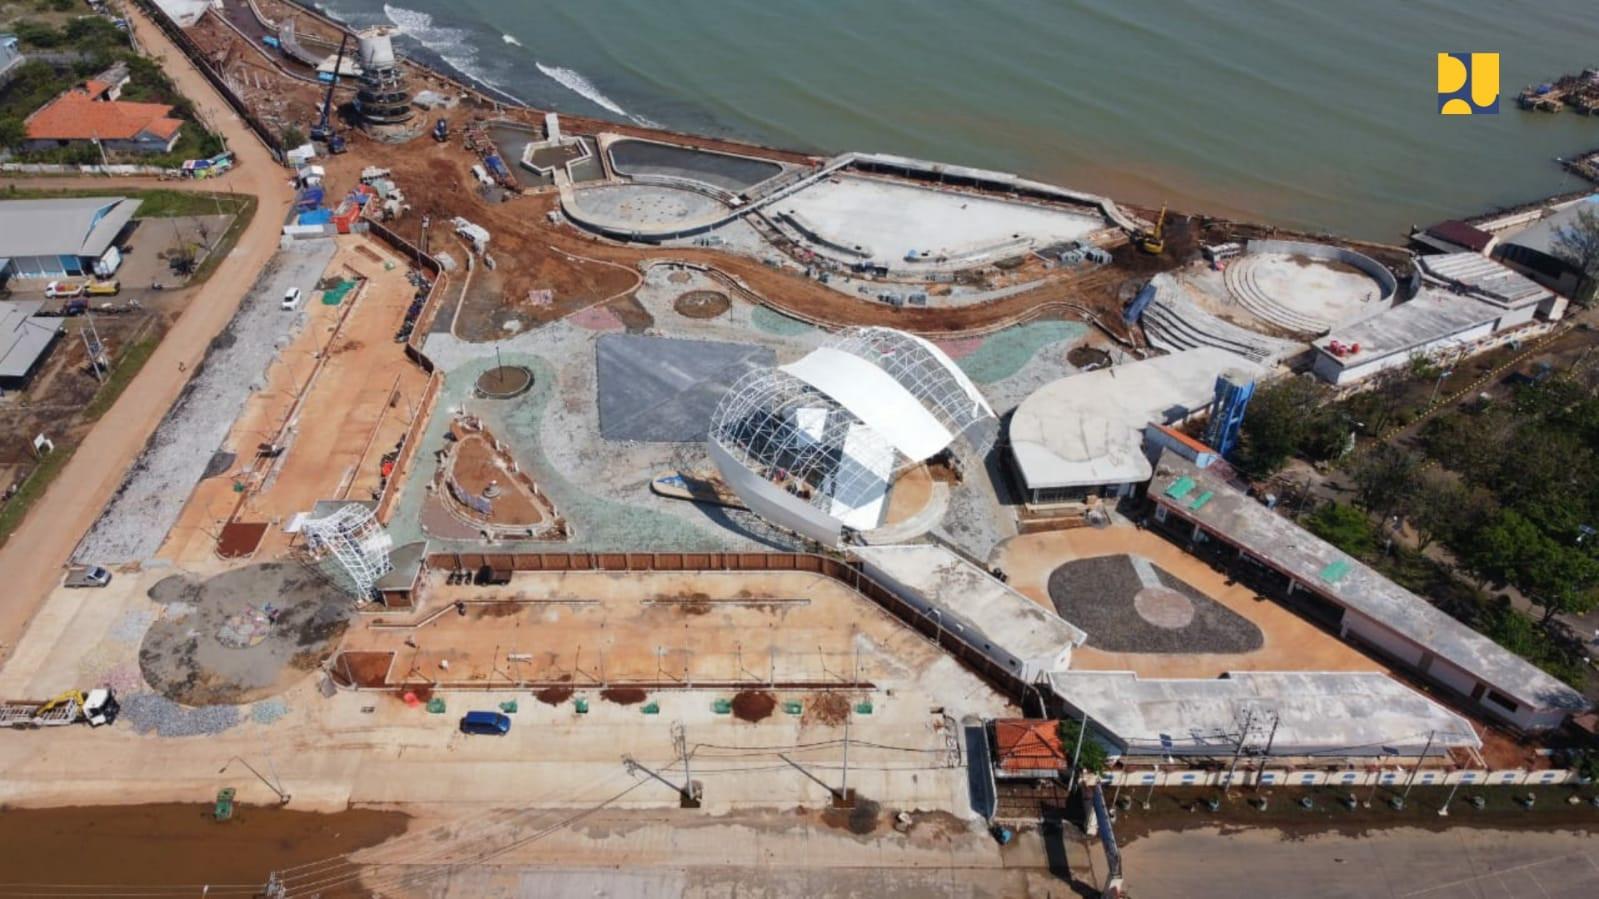 Kementerian PUPR Bidik Potensi Laut Pekalongan Jadi Pusat Wisata - JPNN.com